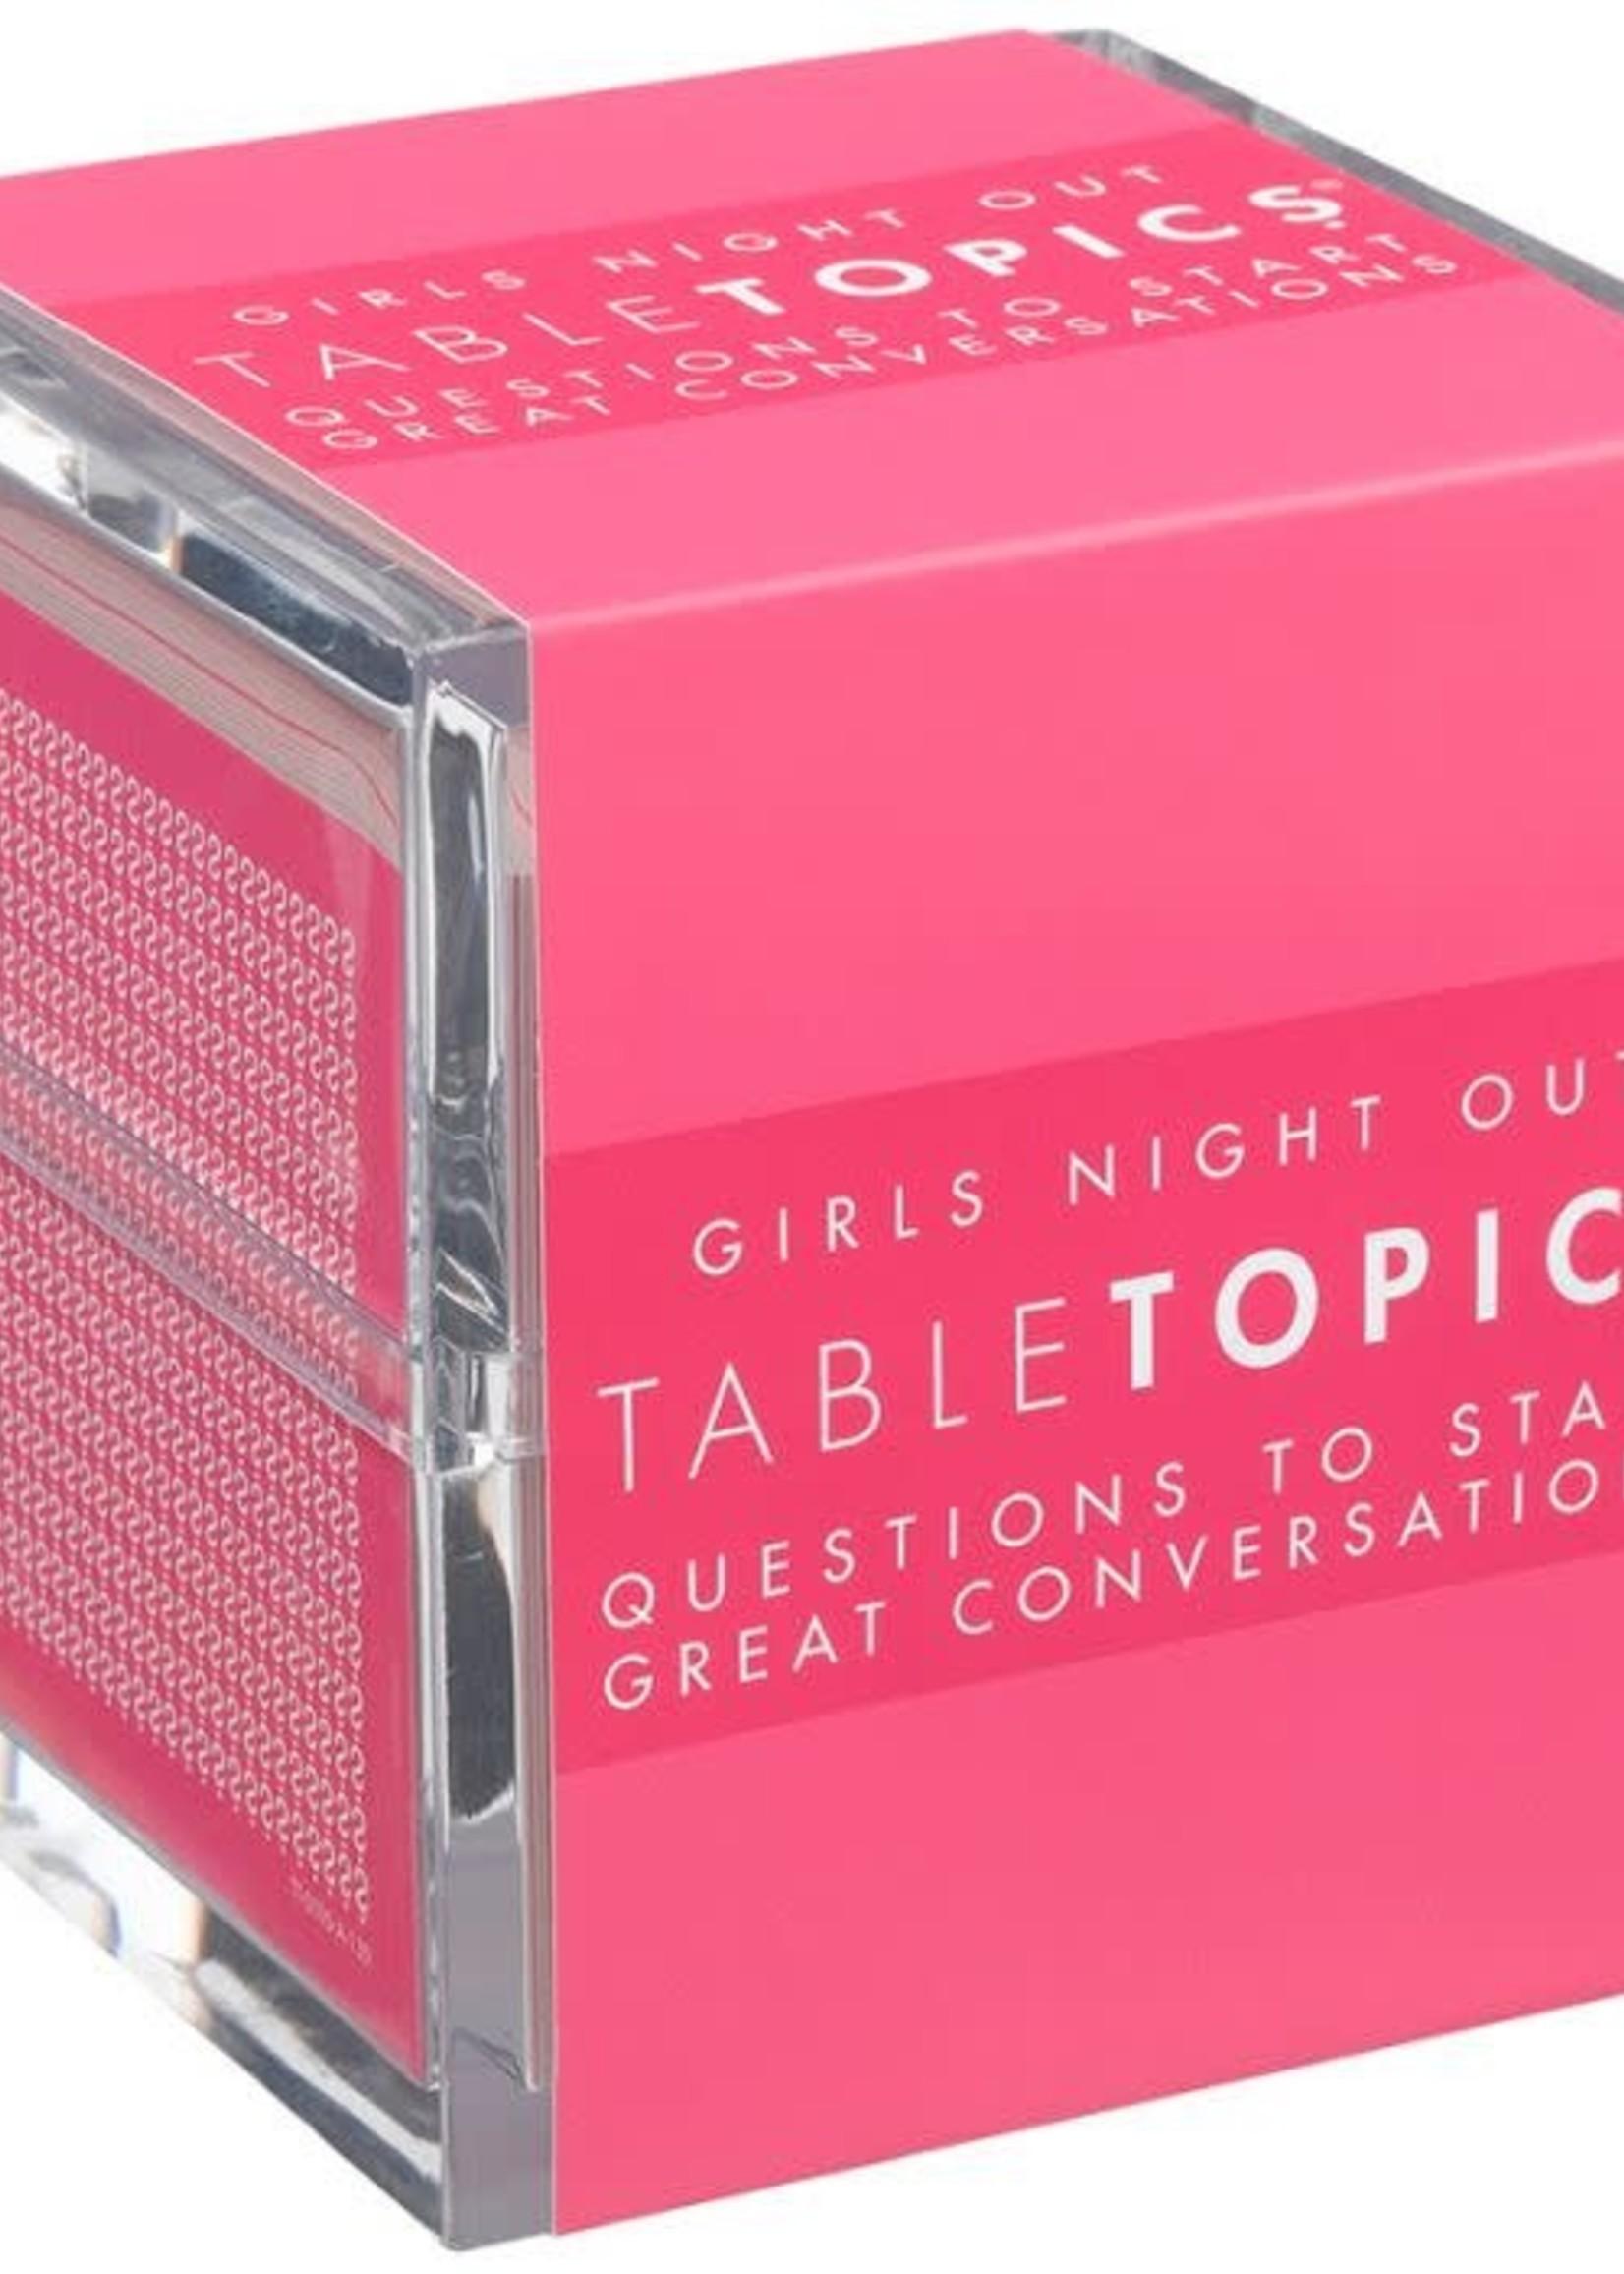 TabelTopics TableTopics: